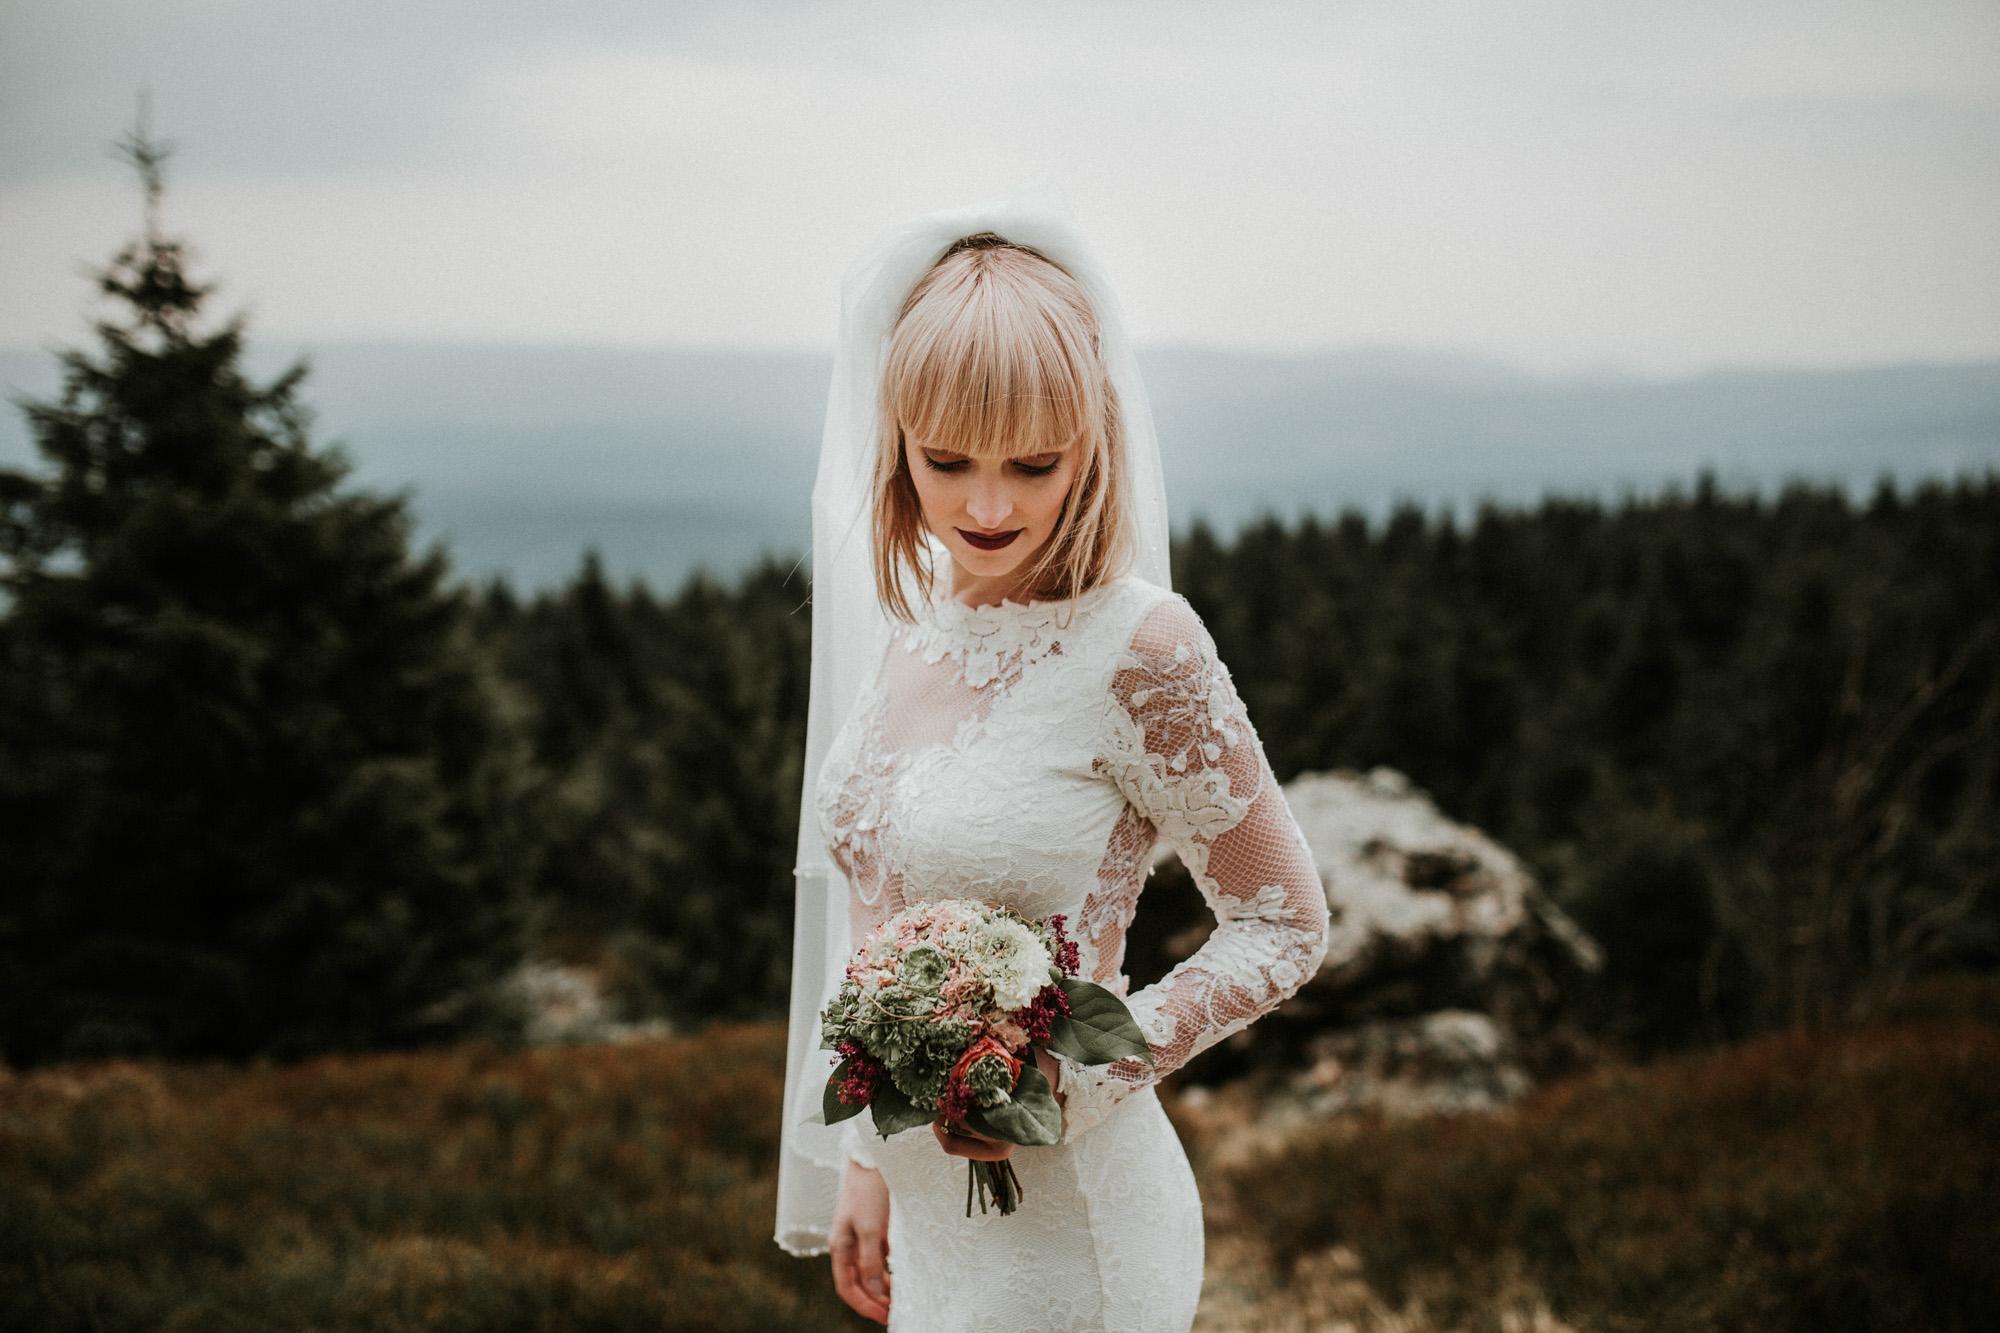 DanielaMarquardtPhotography_Hochzeitsfotograf_Düsseldorf_Köln_Mallorca_Bayern_Austria_Harz_LinaundMaik_Afterwedding-Shooting_Weddingphotographer_Ibiza_Tuskany_Italien_Toskana109